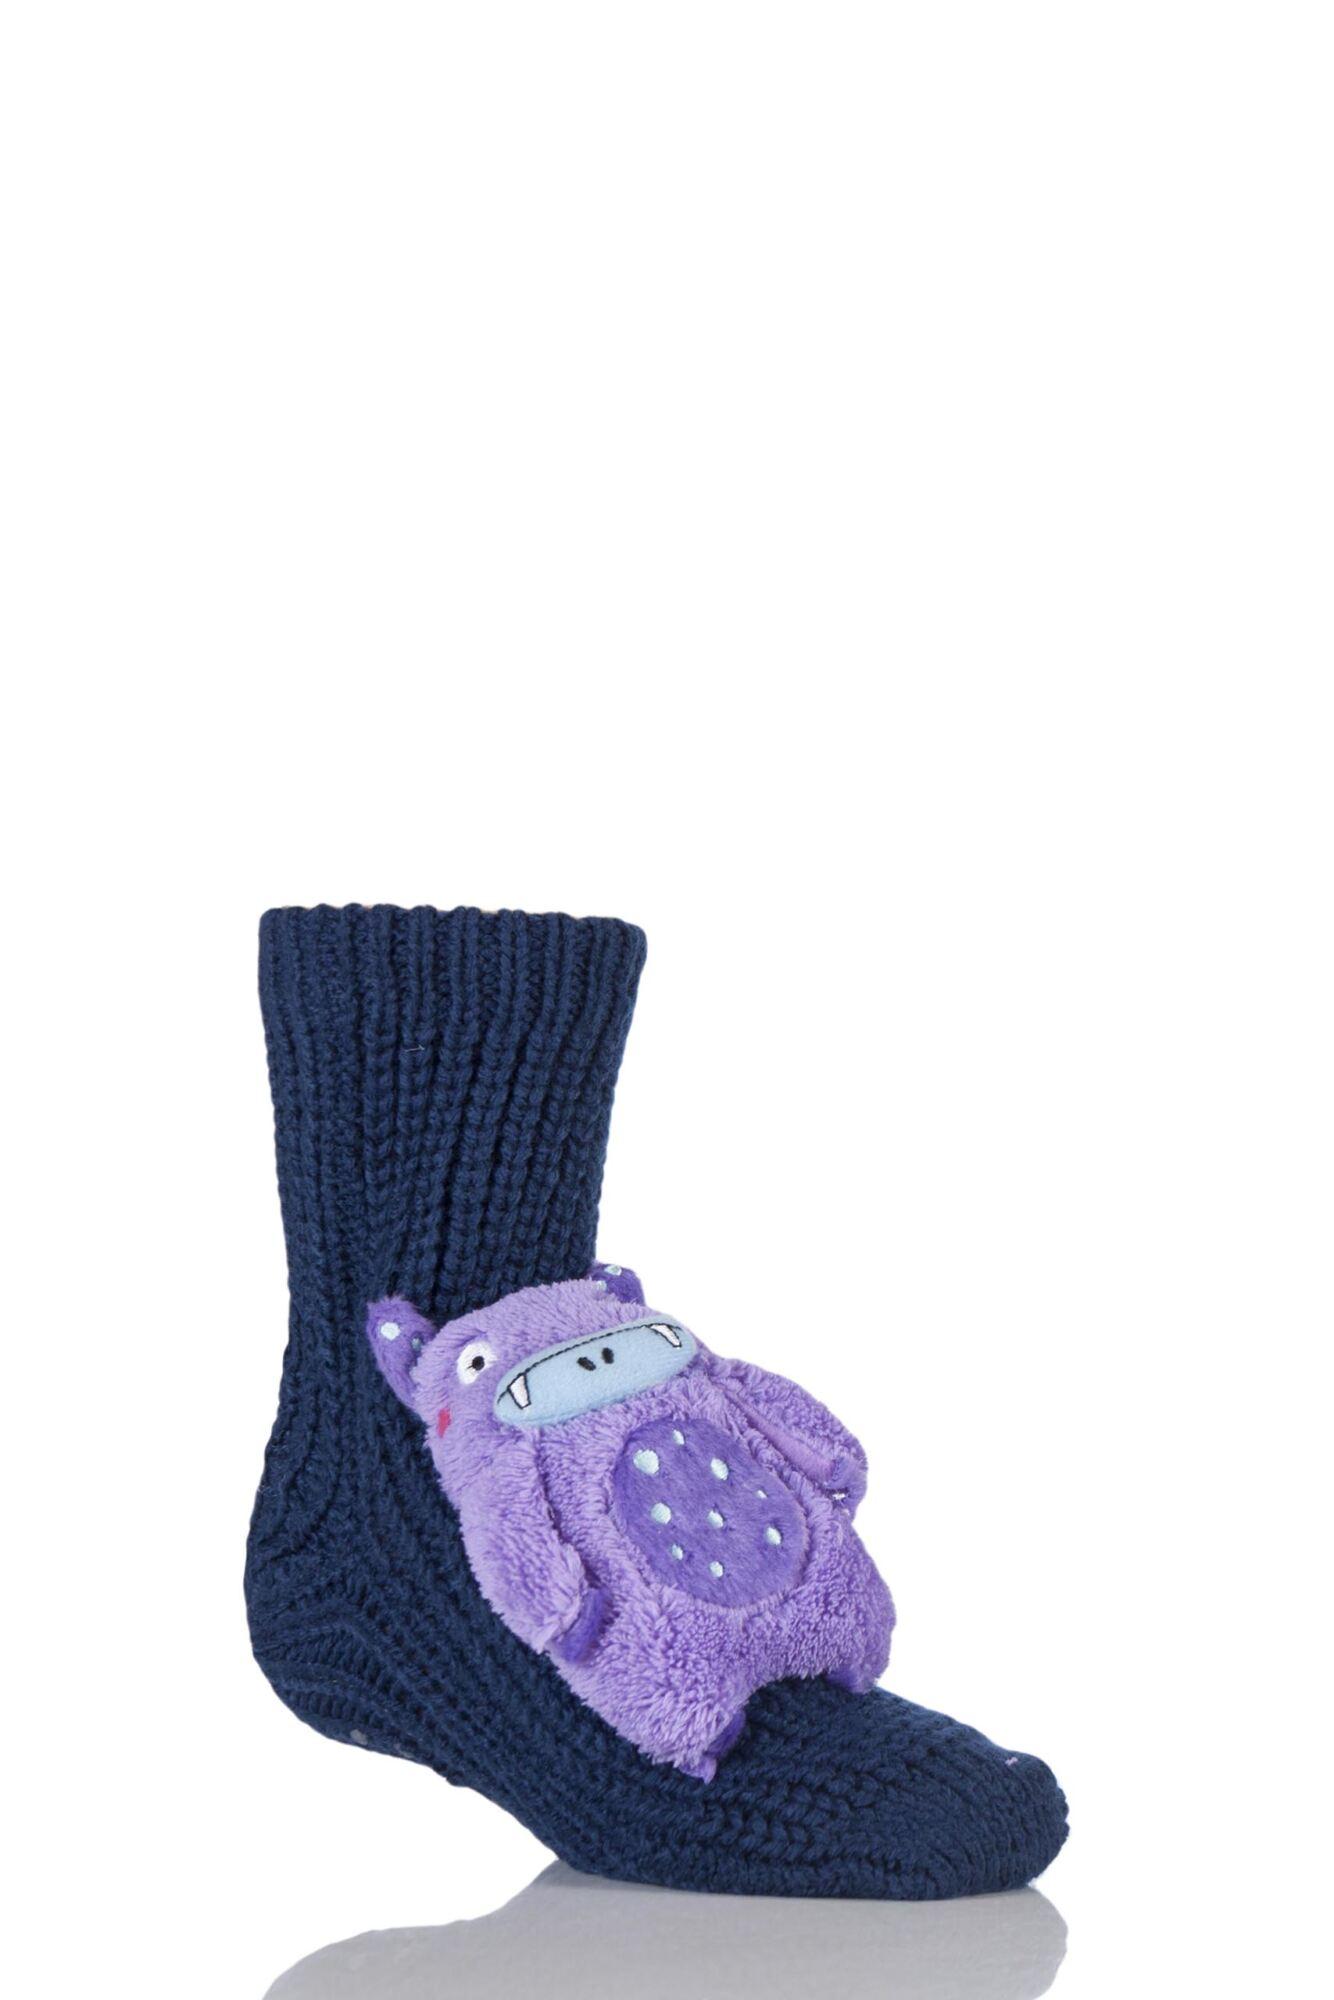 1 Pair Toy Box Socks Monster With Non-slip Grip Boys